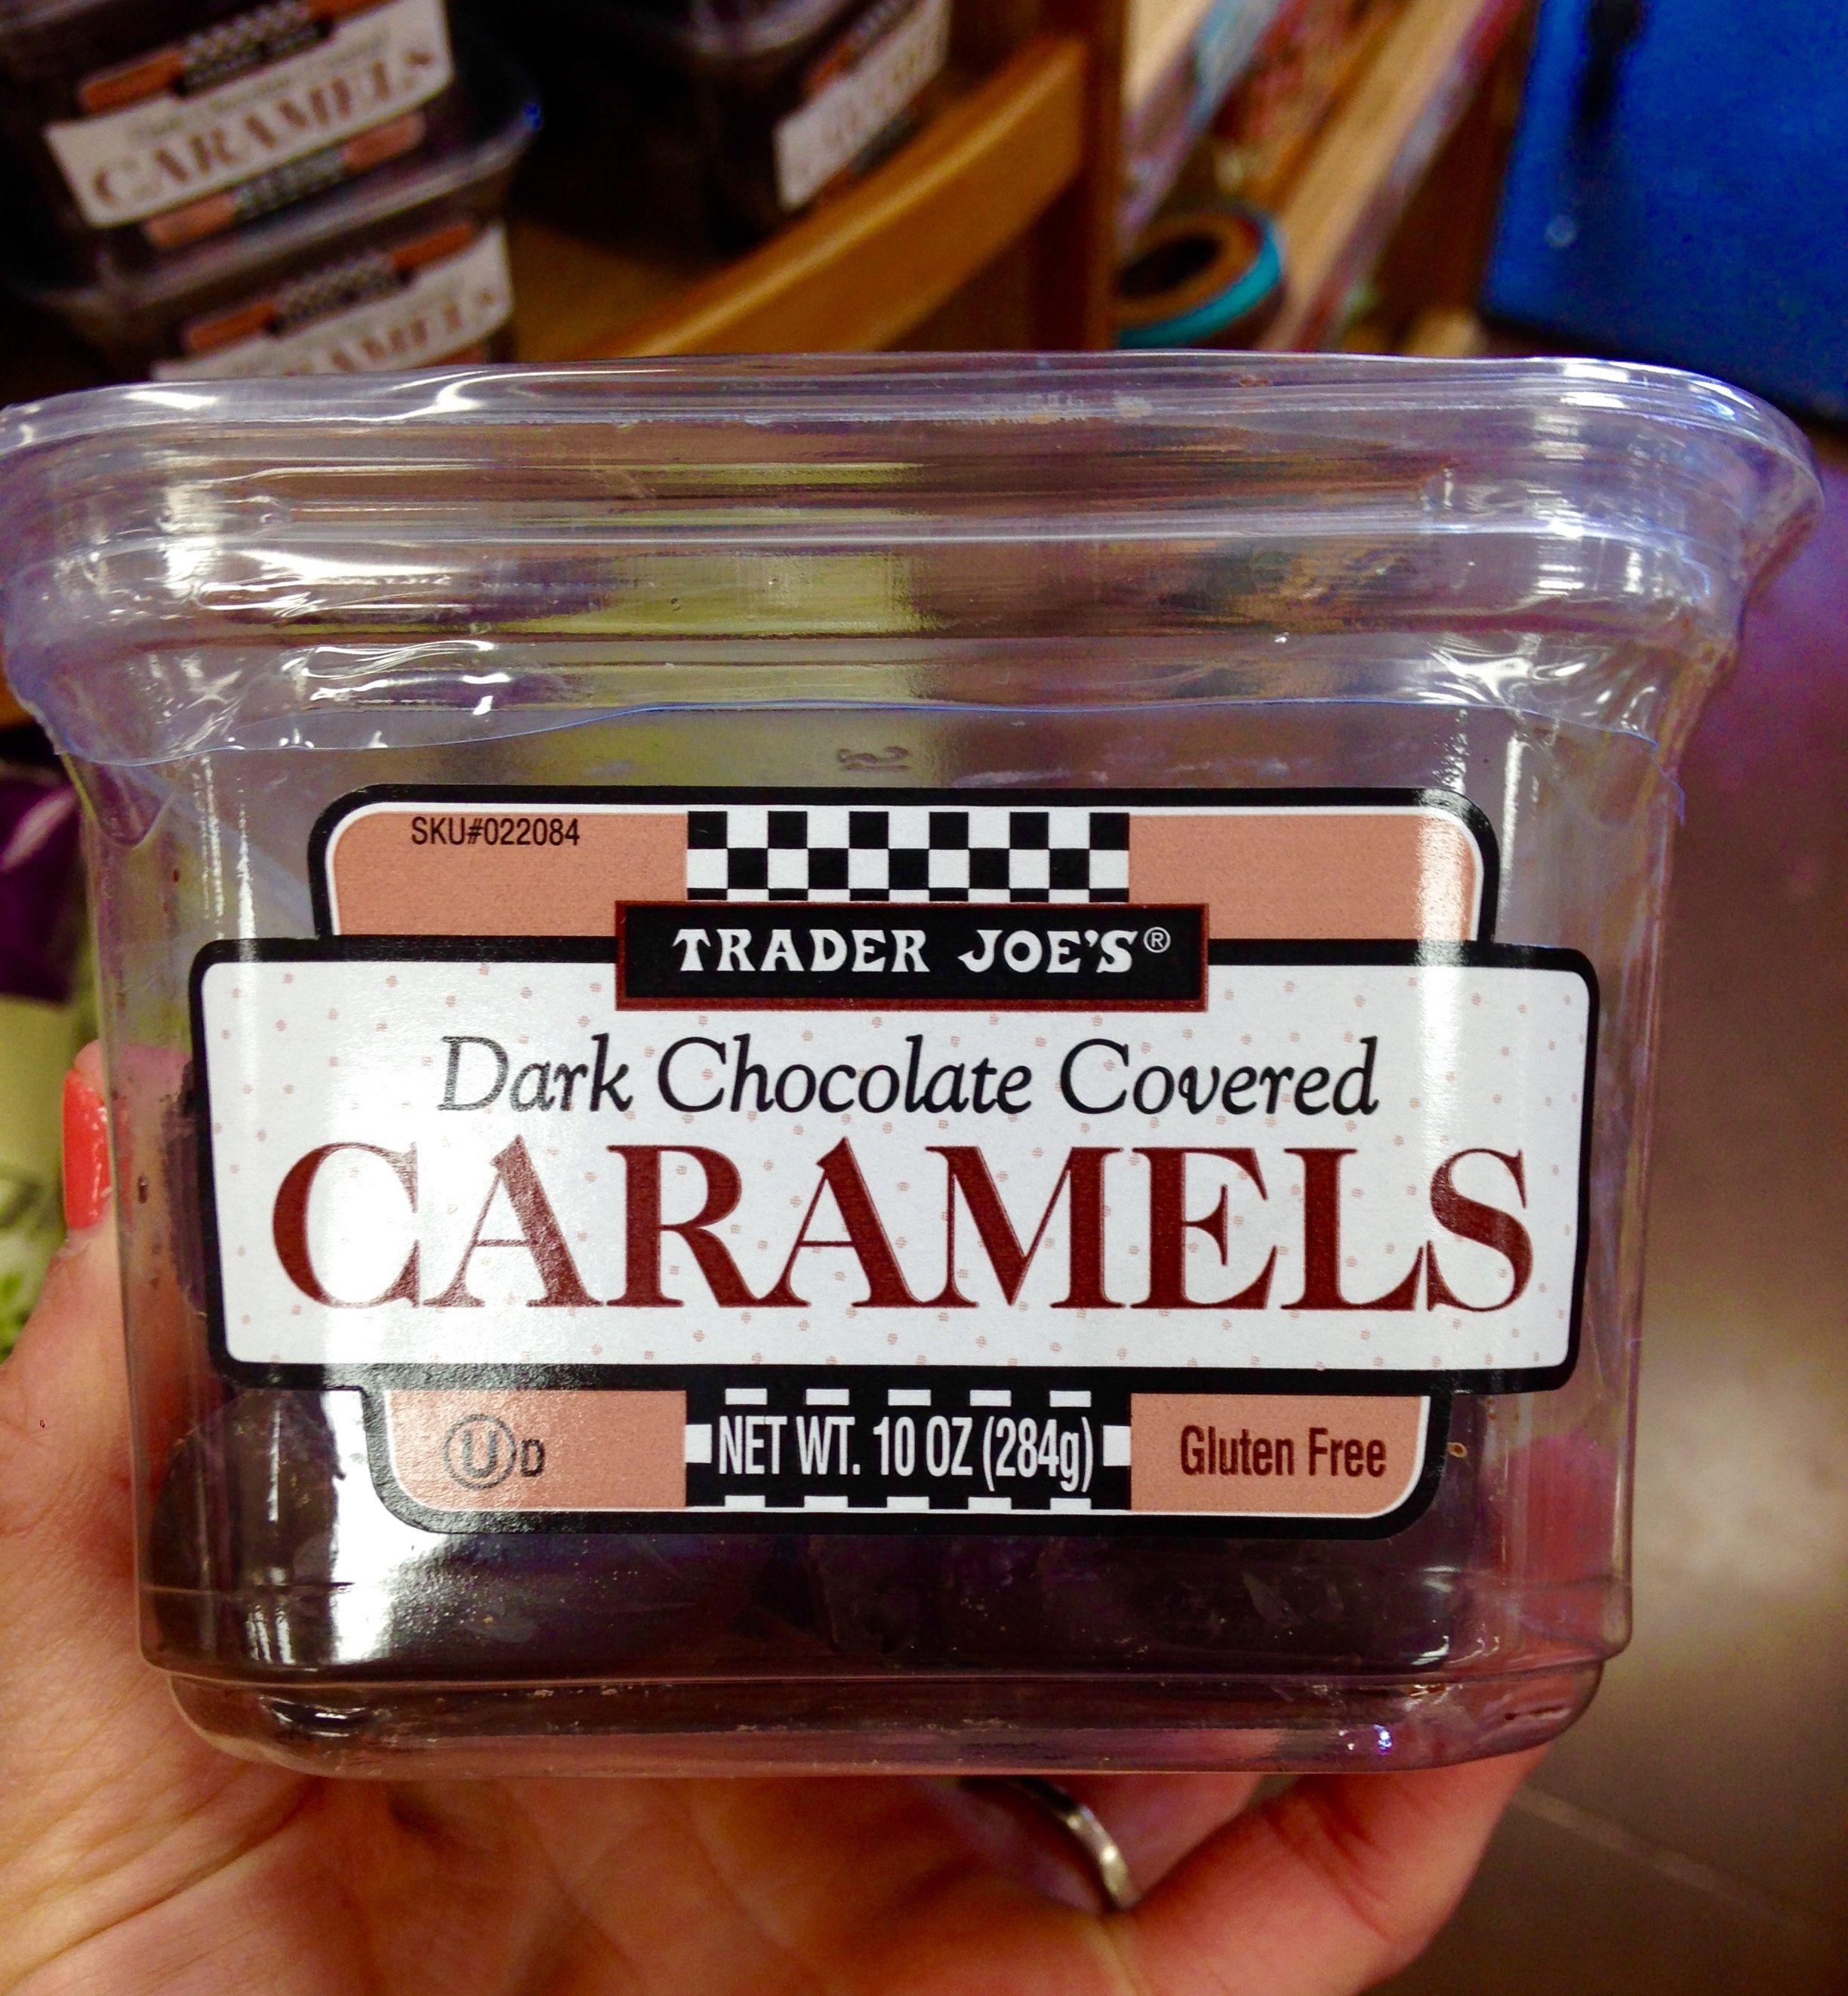 caramels.jpg 2,448×2,644 pixels Chocolate covered, Dark